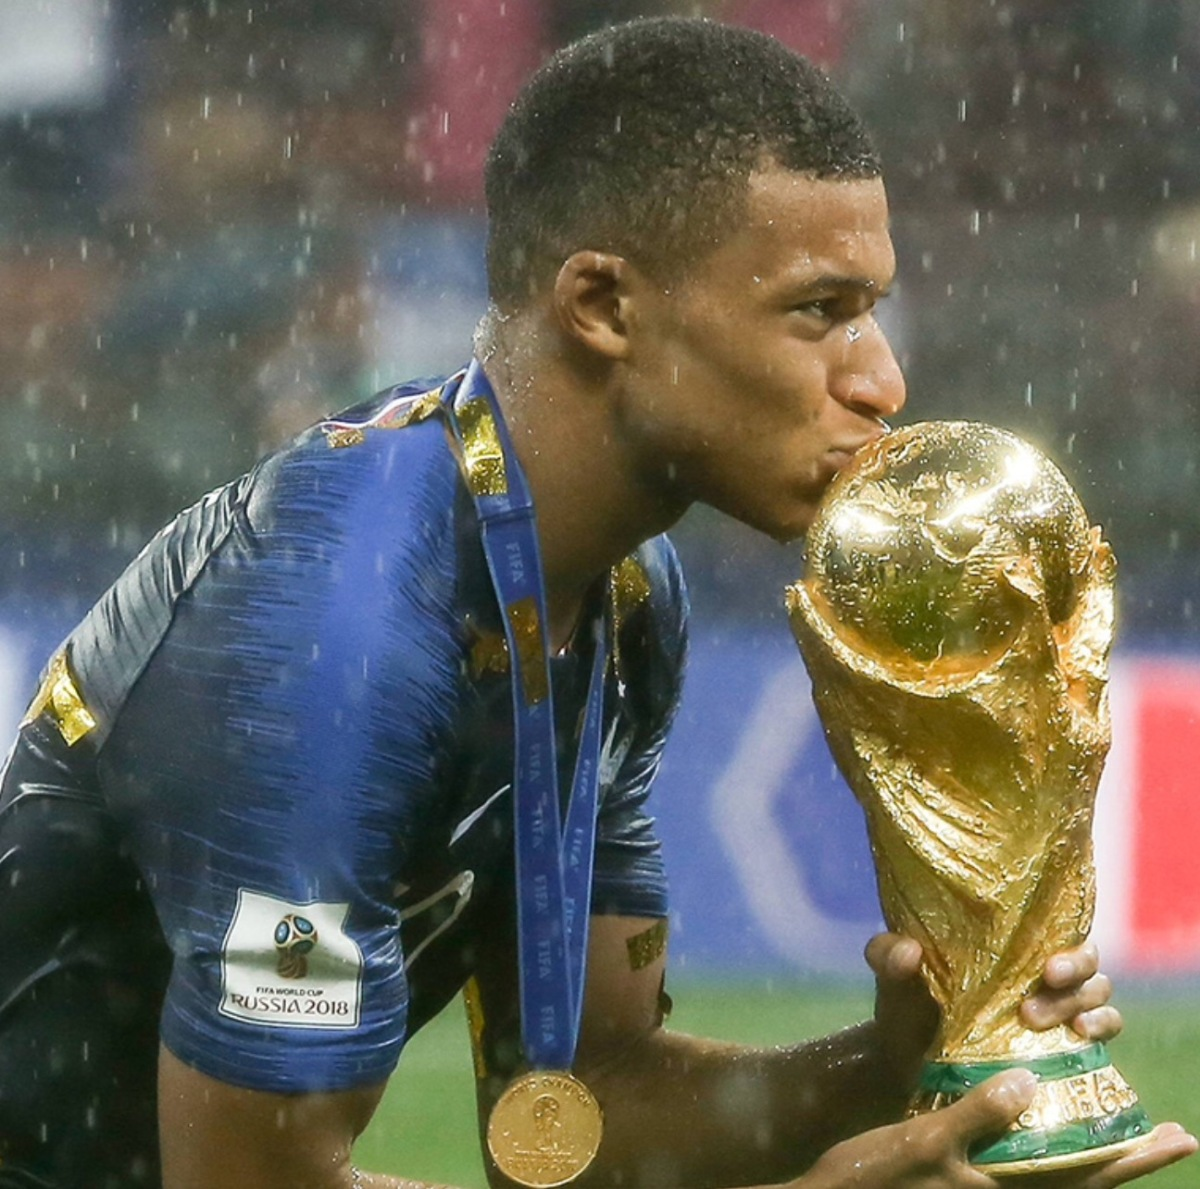 Kylian Mbappe è già più forte di Cristiano Ronaldo; vi spiegoperché